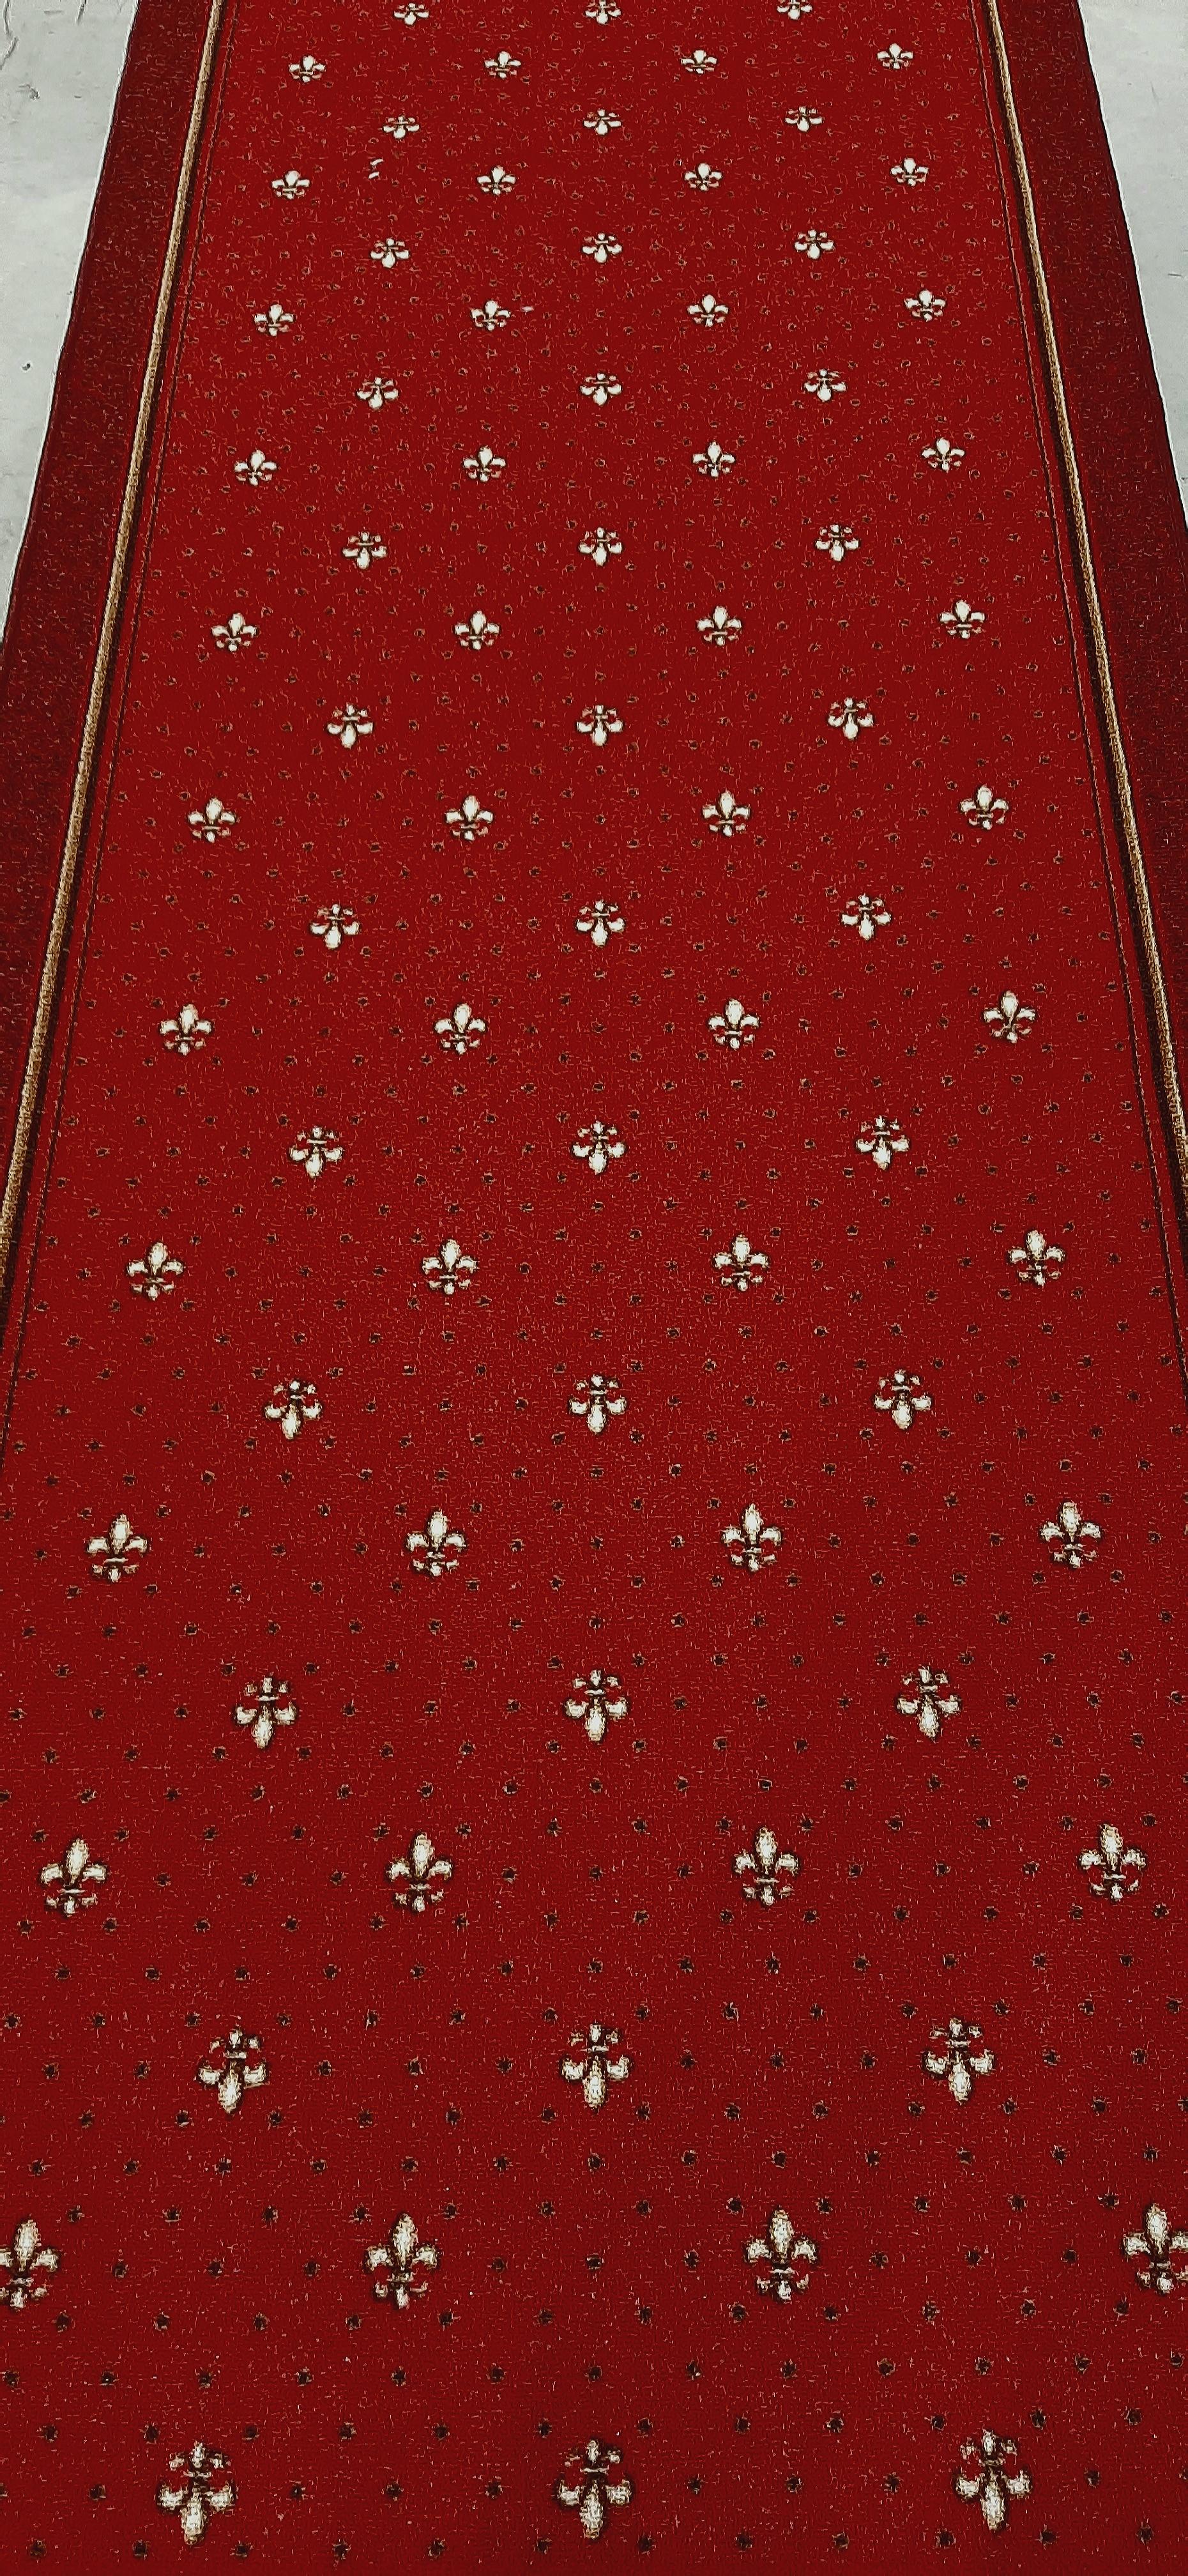 Traversa Tesatura Plata 1835, Rosu, 100x1500 cm, 820 gr/mp 1